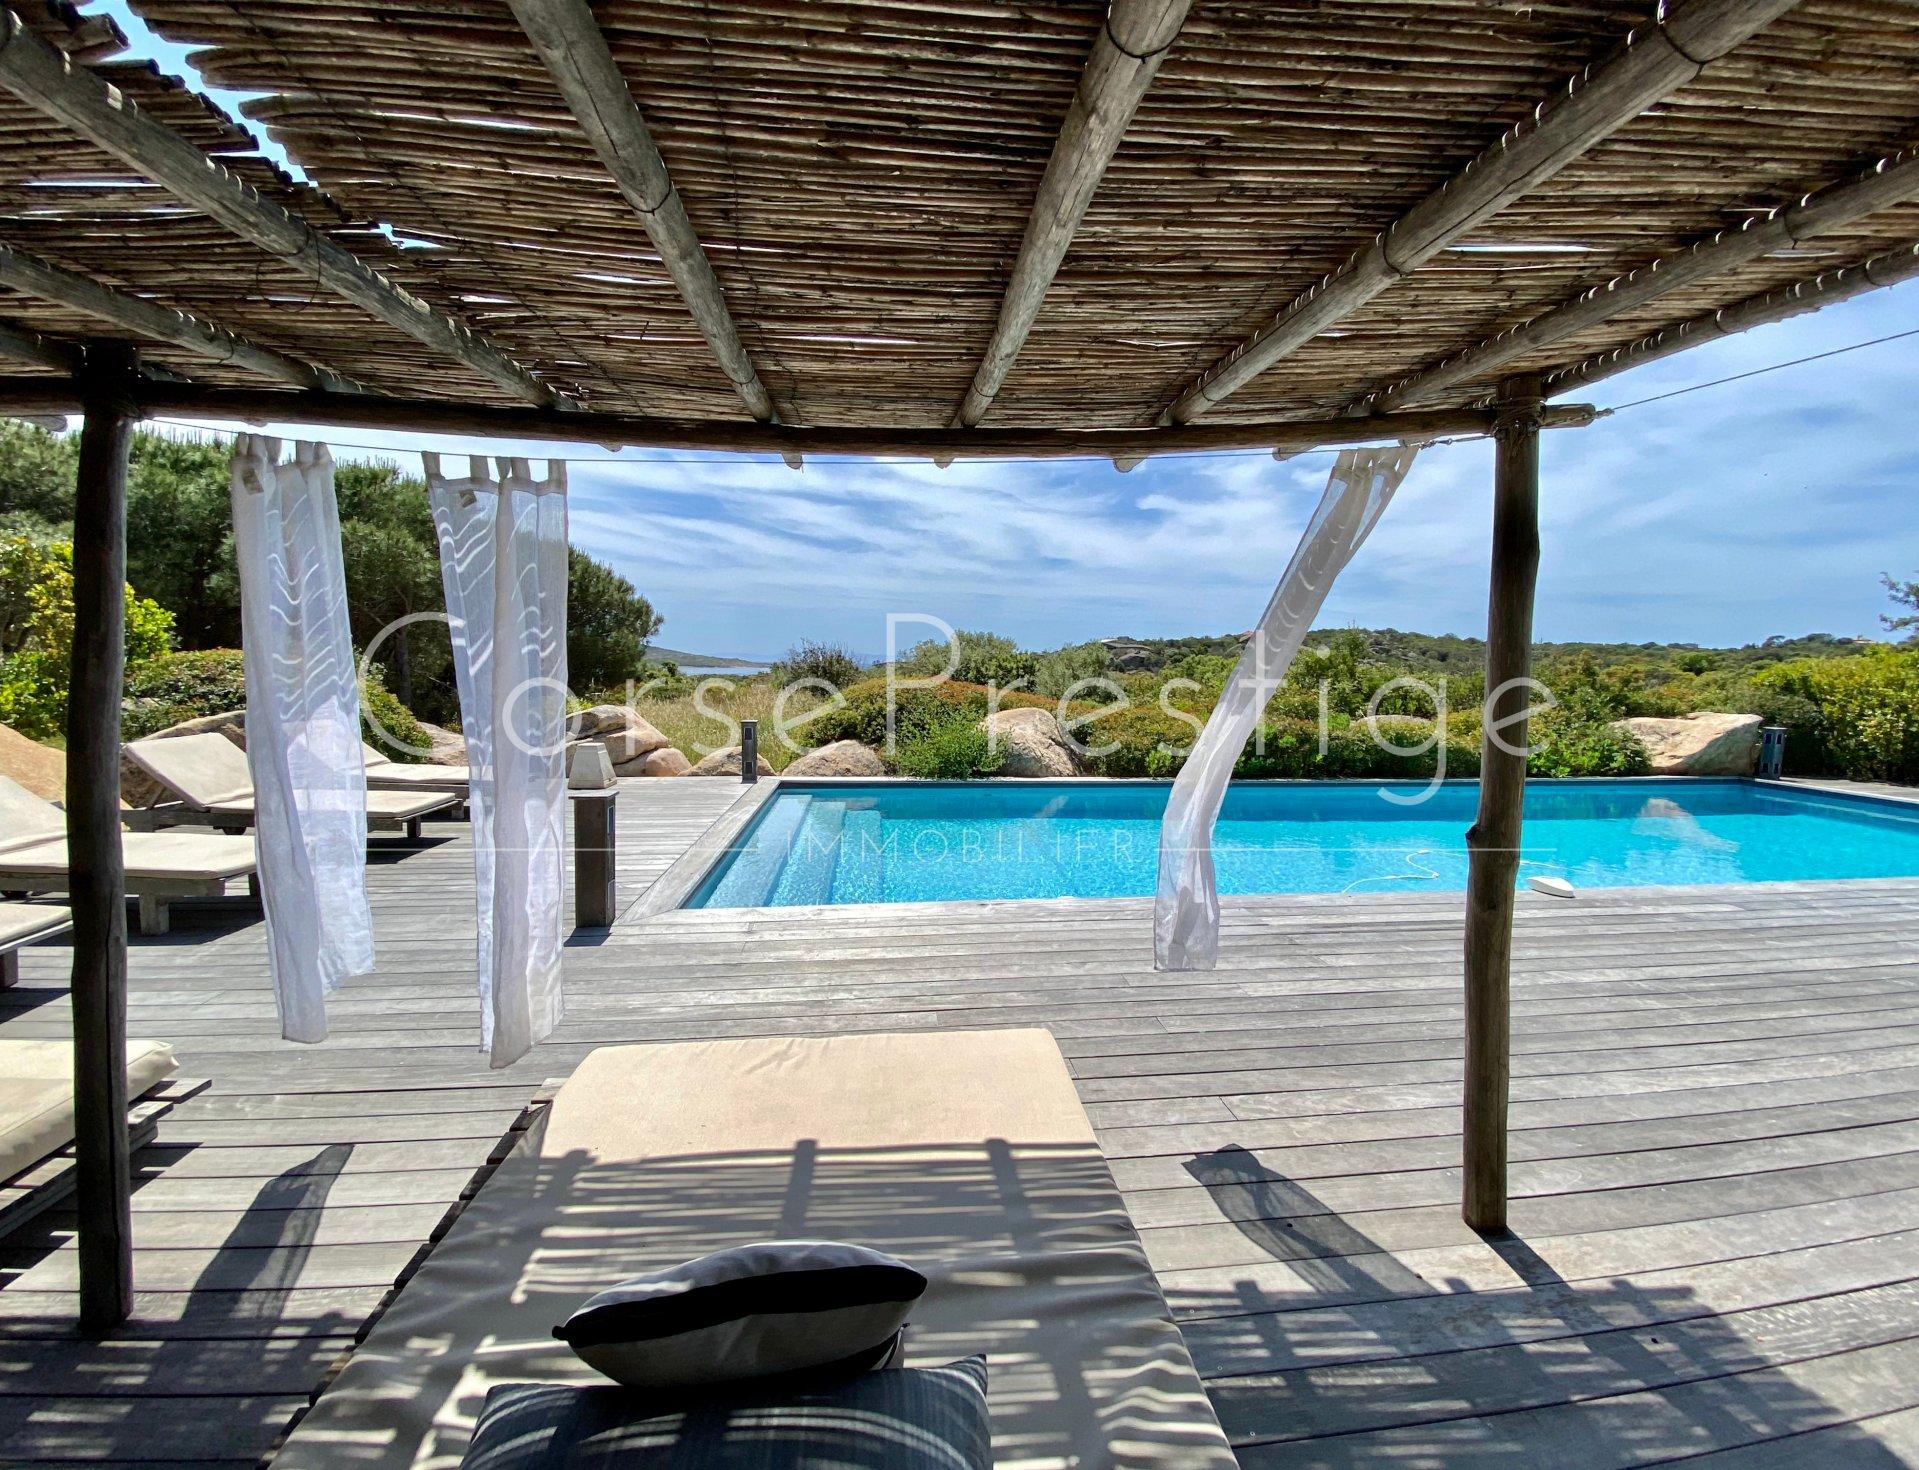 luxury property for sale in pianottoli caldarello image3